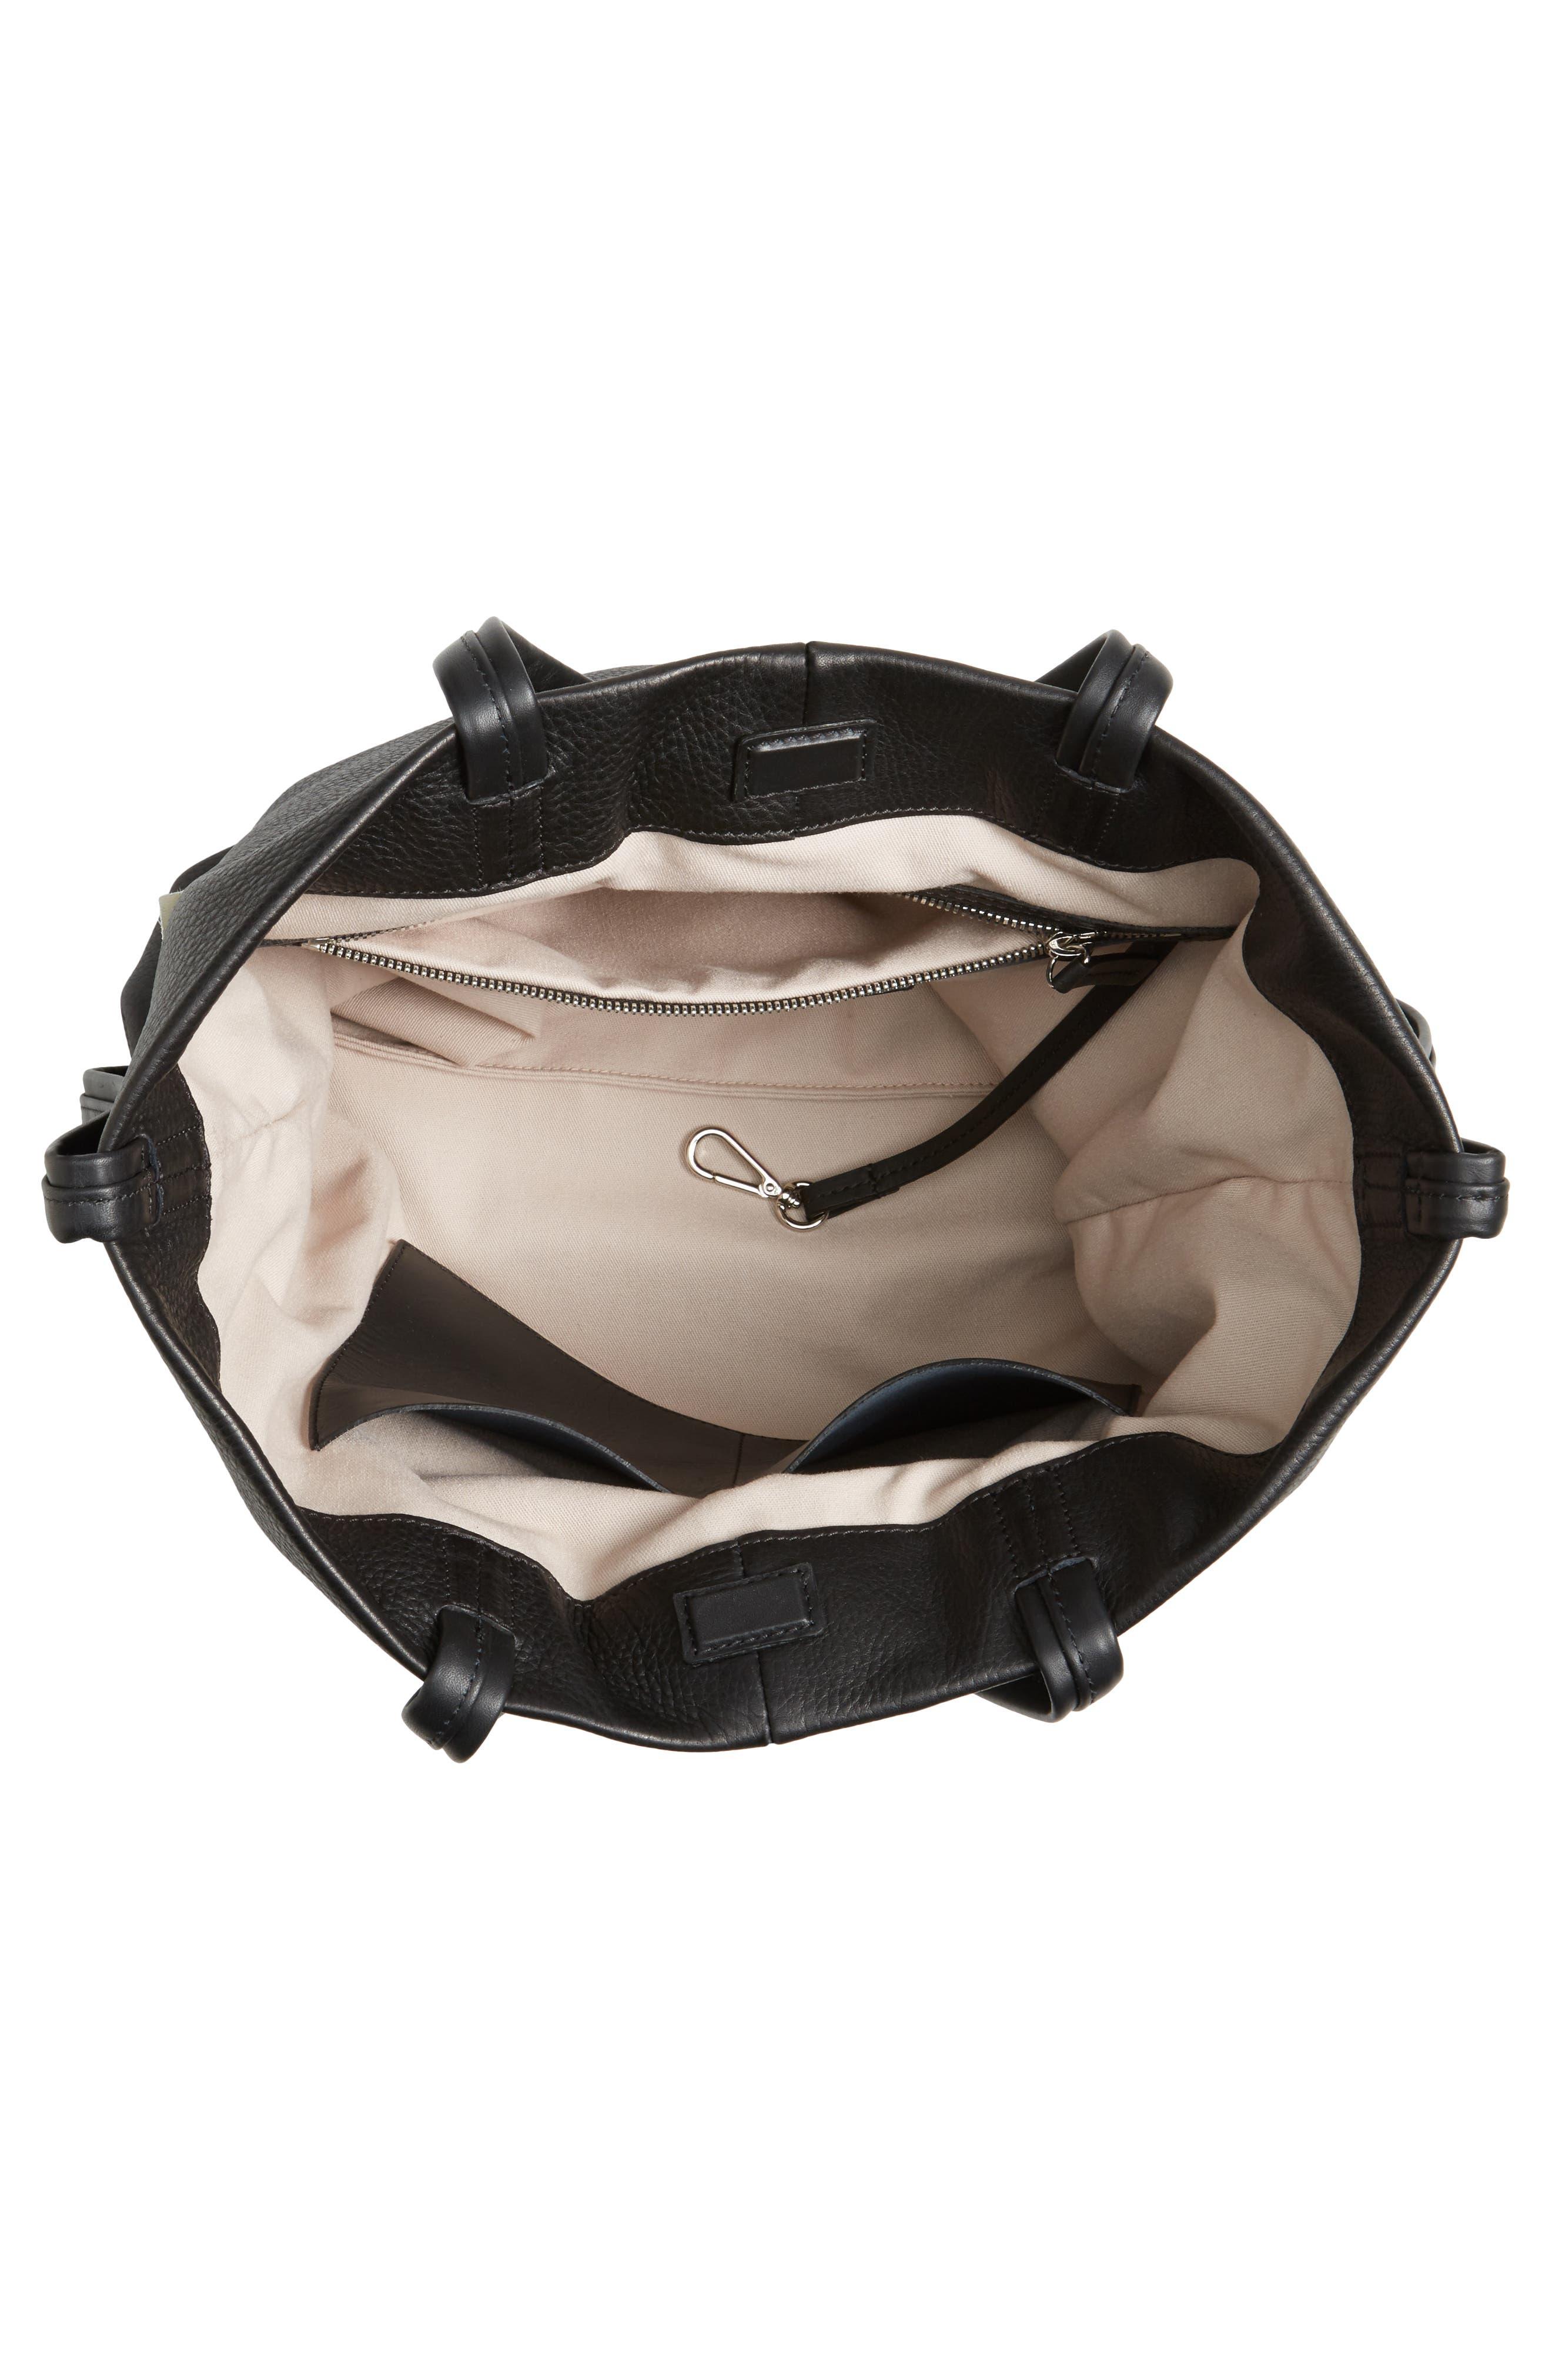 Latigo Square Pebbled Leather Shopper Tote,                             Alternate thumbnail 4, color,                             001